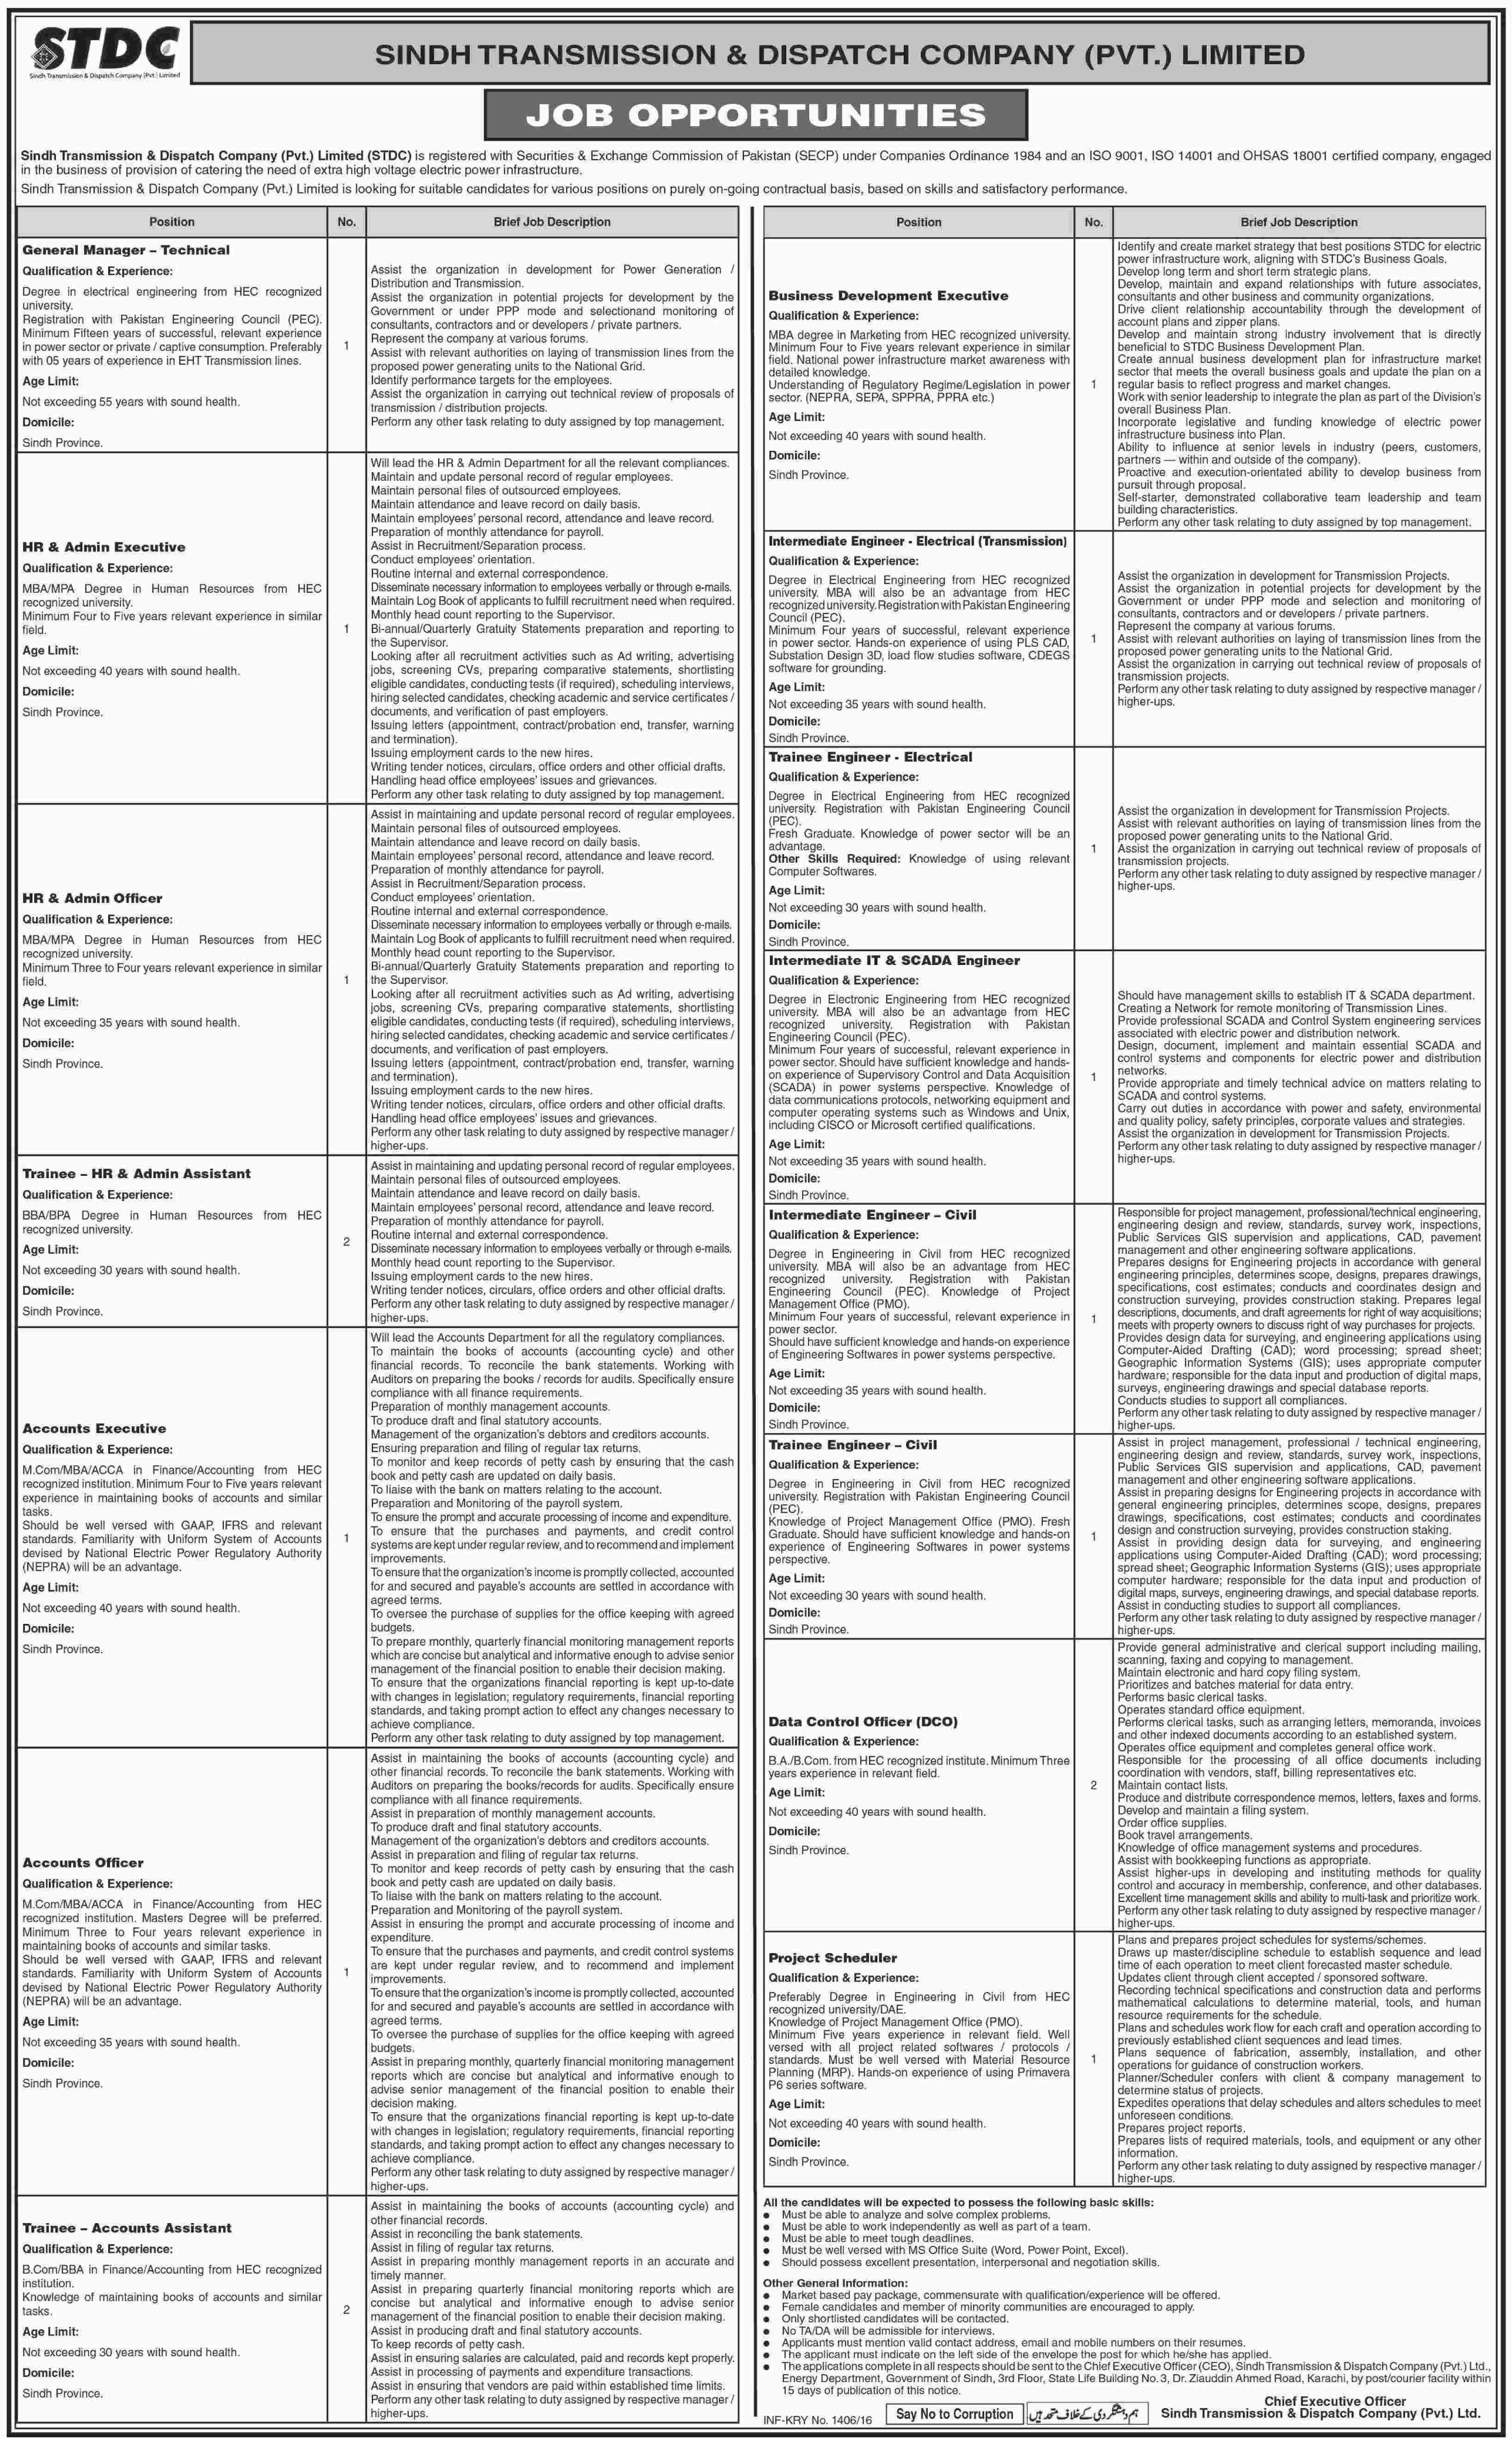 STDC Job Vacancies Daily Dawn April 11, 2016 Monday